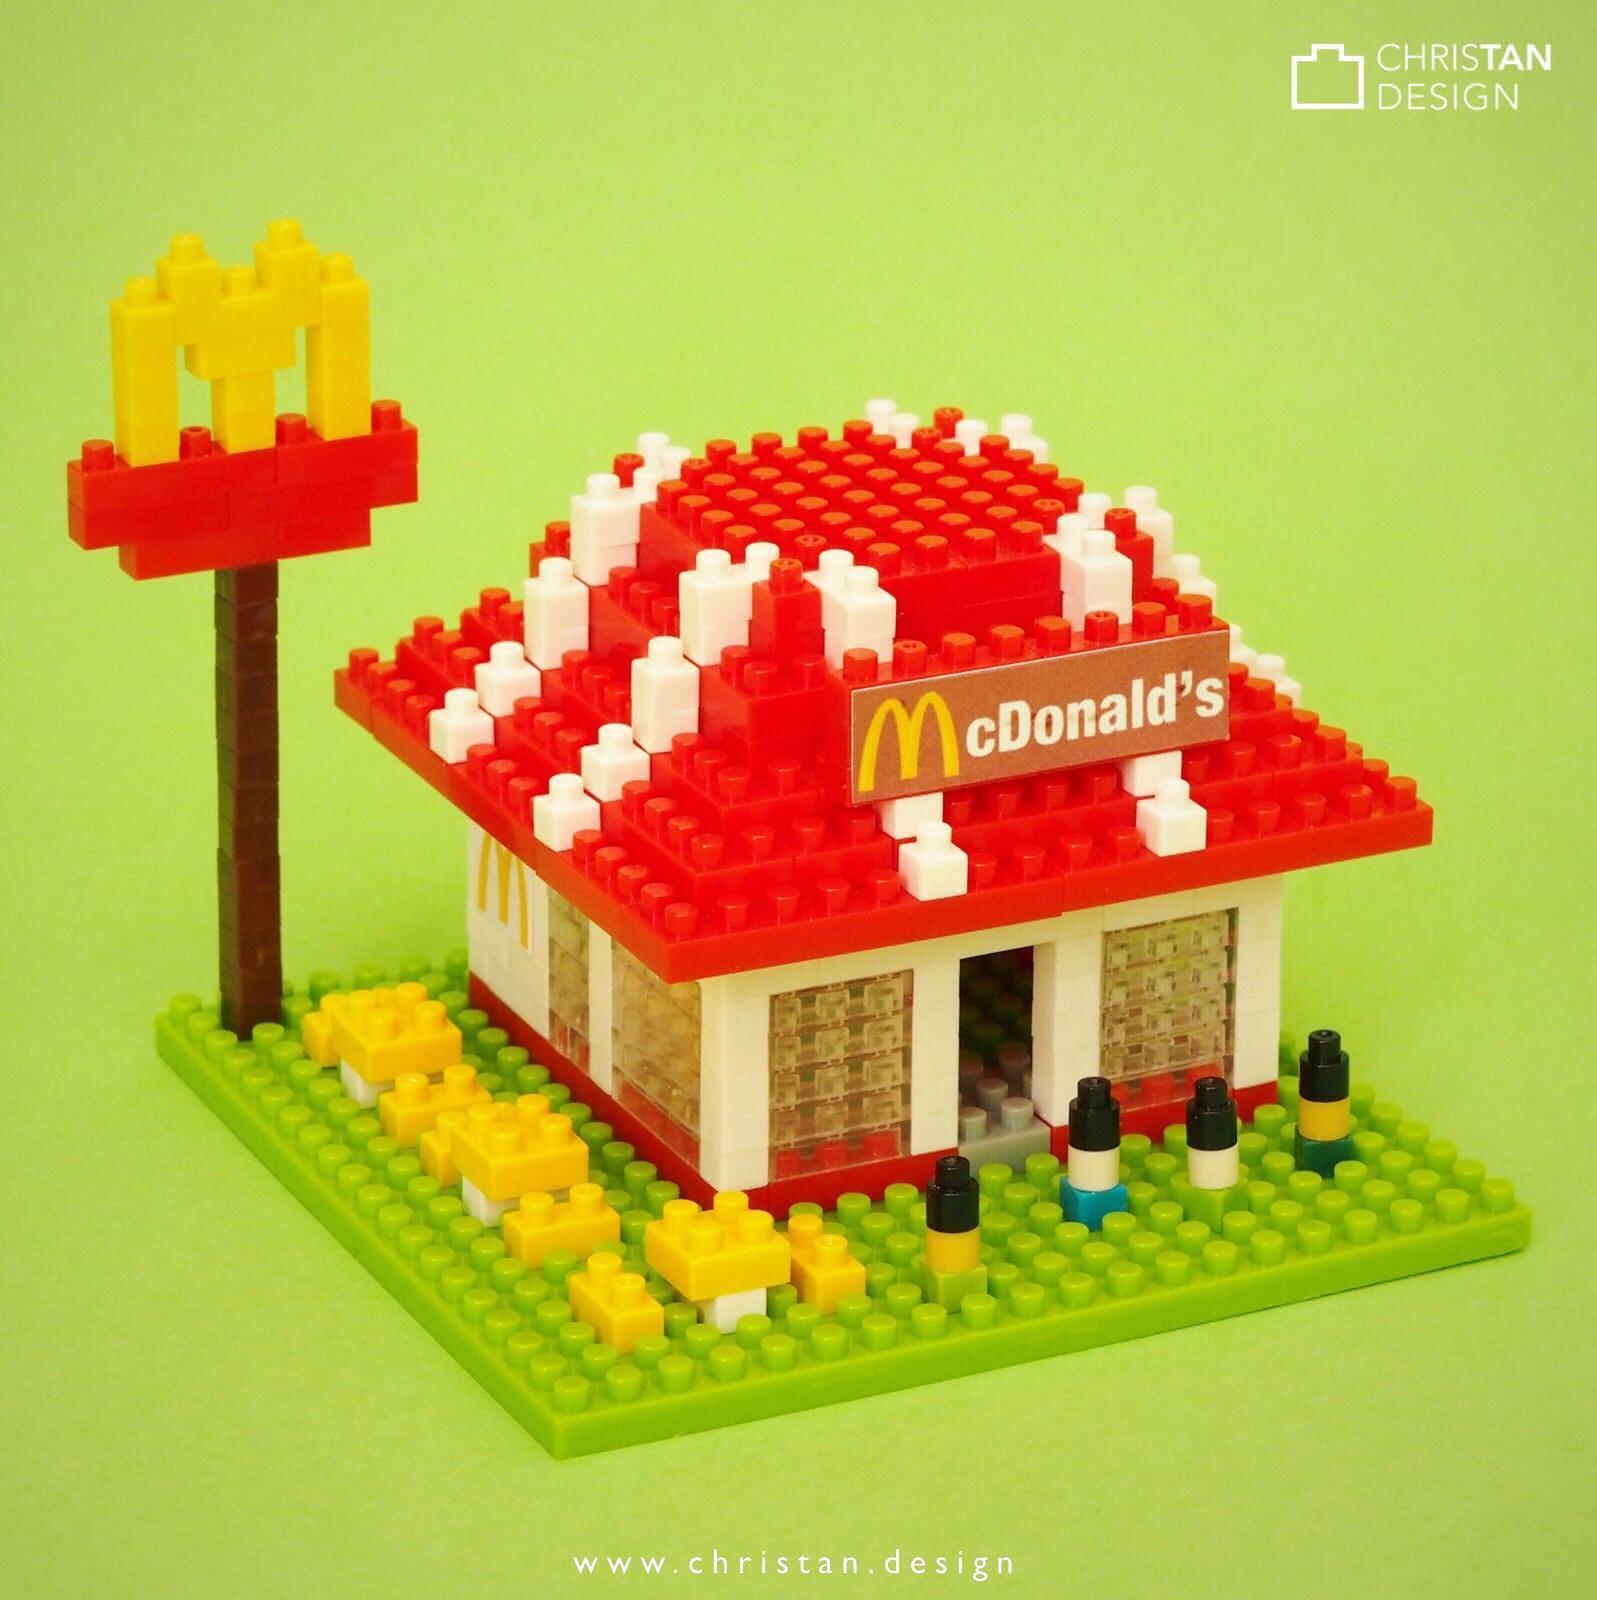 nanoblock McDonald's